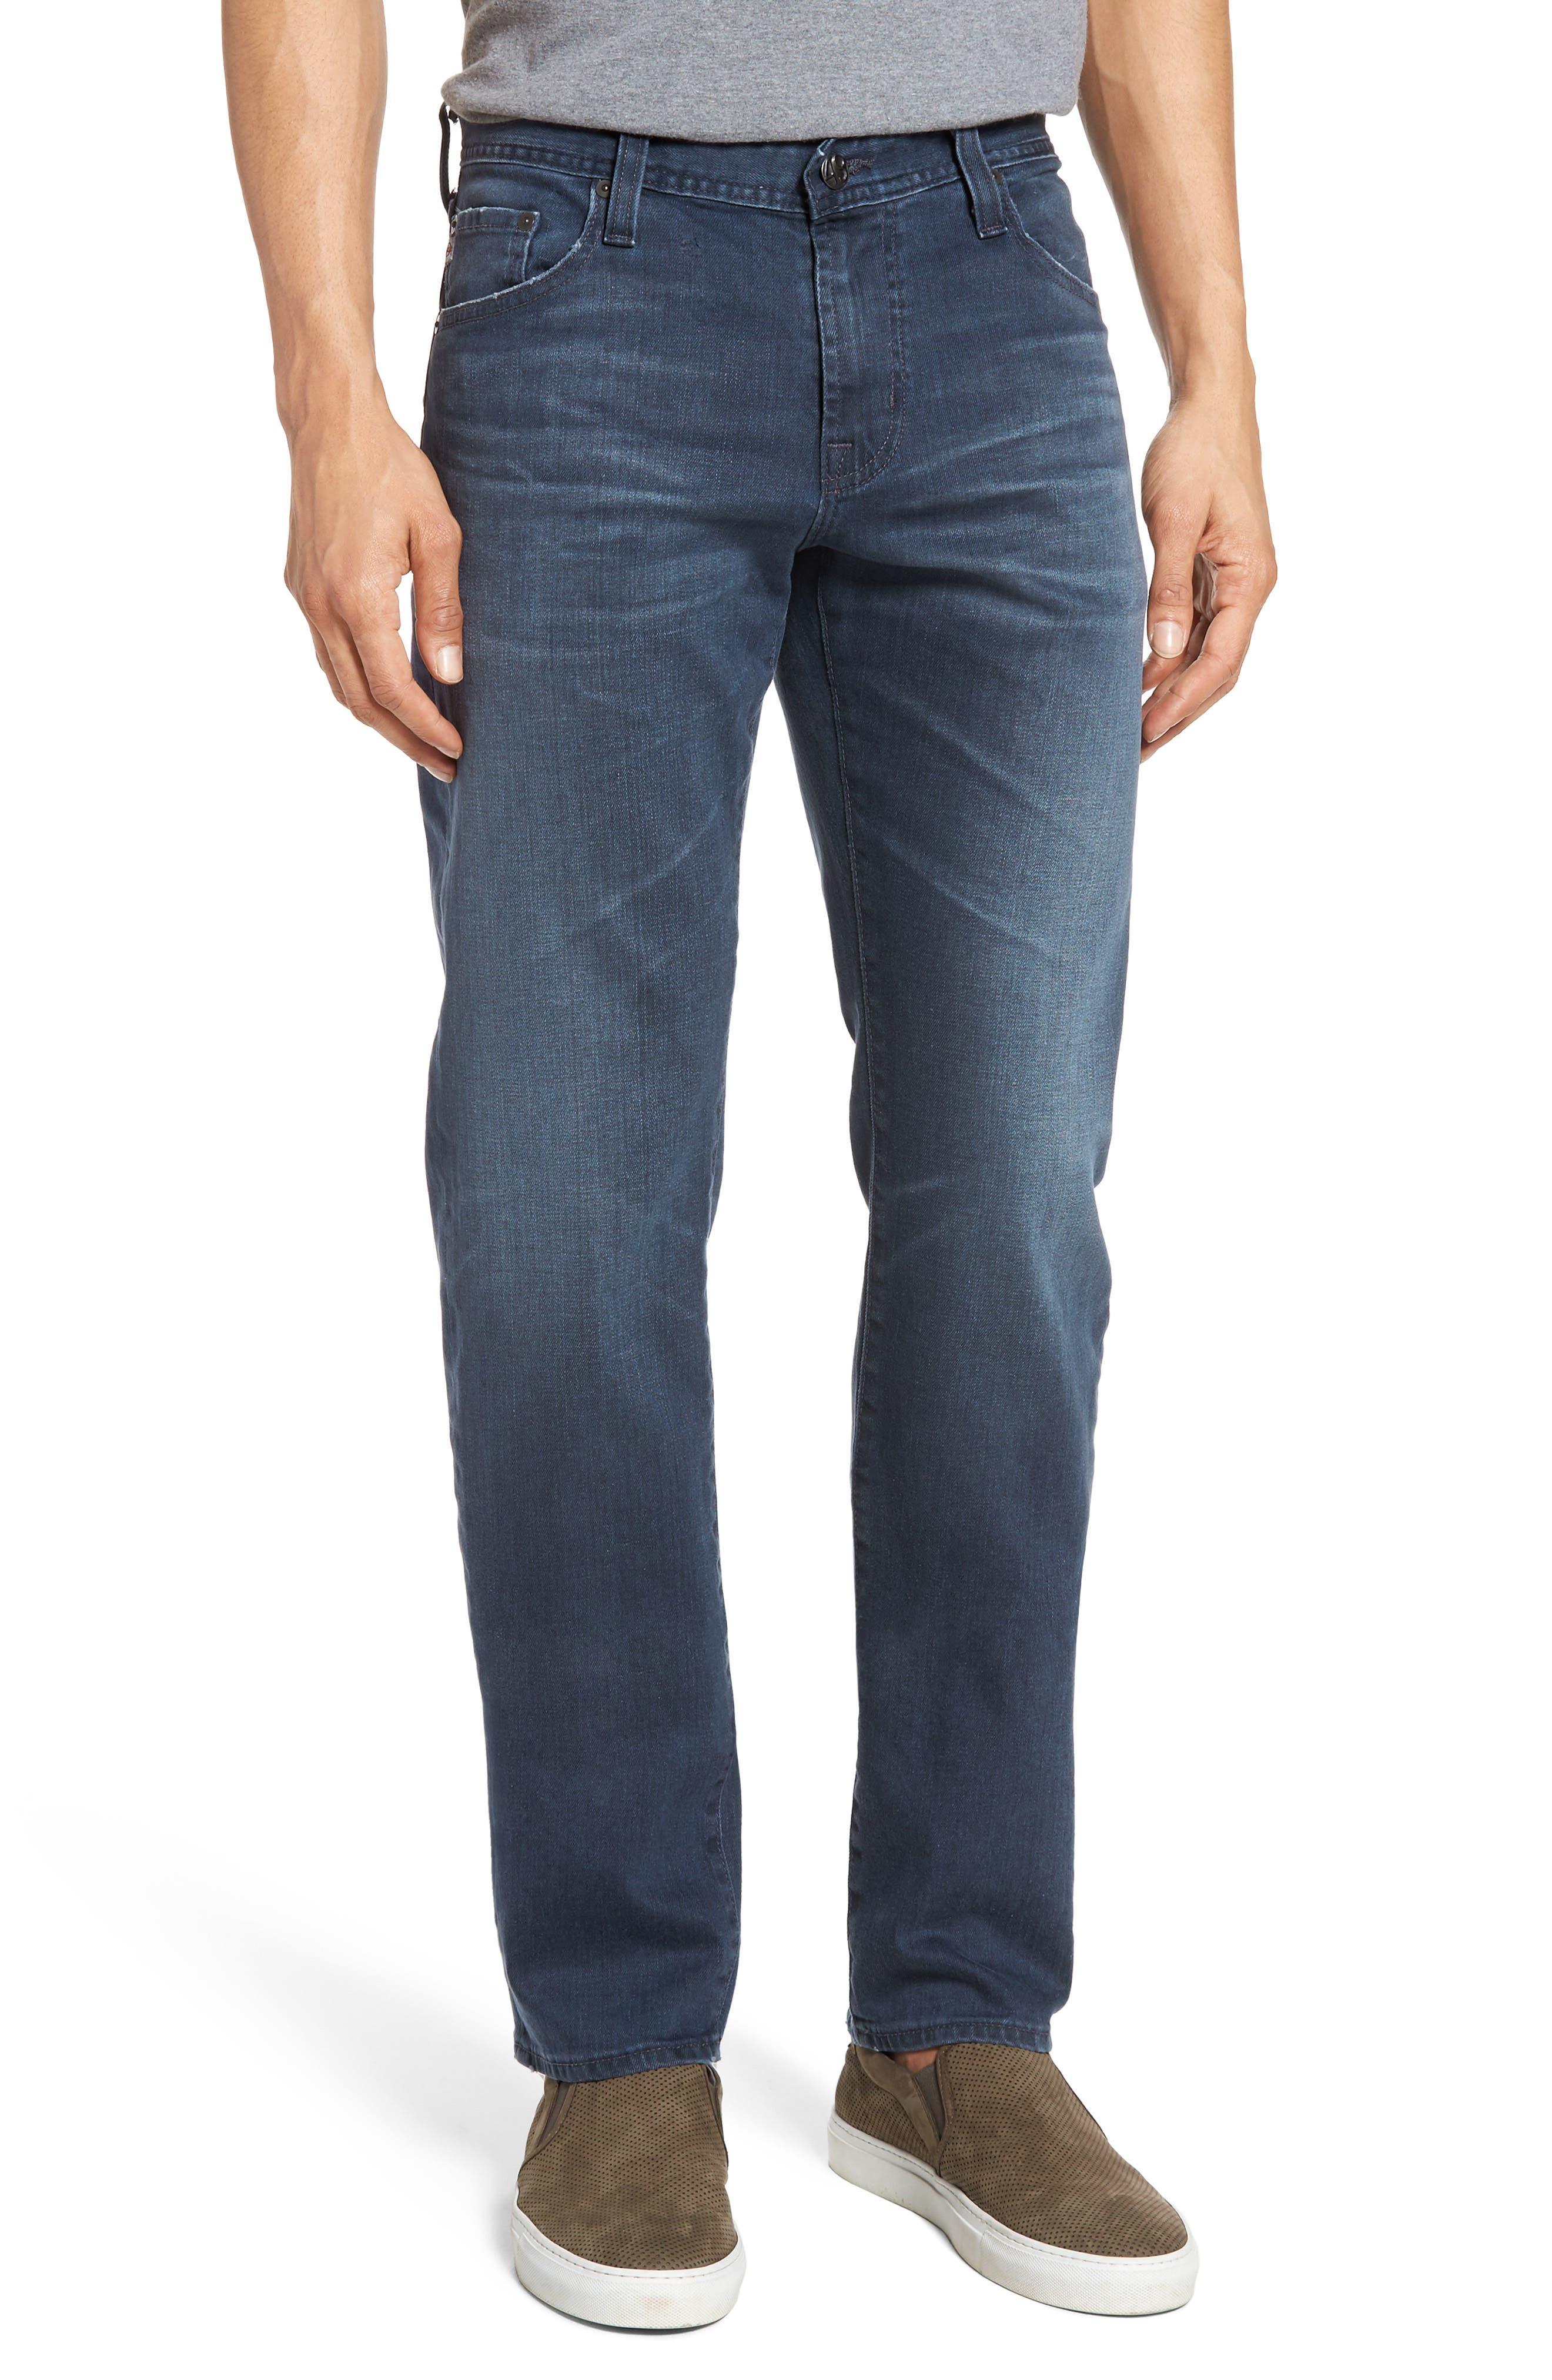 Graduate Slim Straight Leg Jeans,                         Main,                         color, 7 YEARS BLUE PERIL